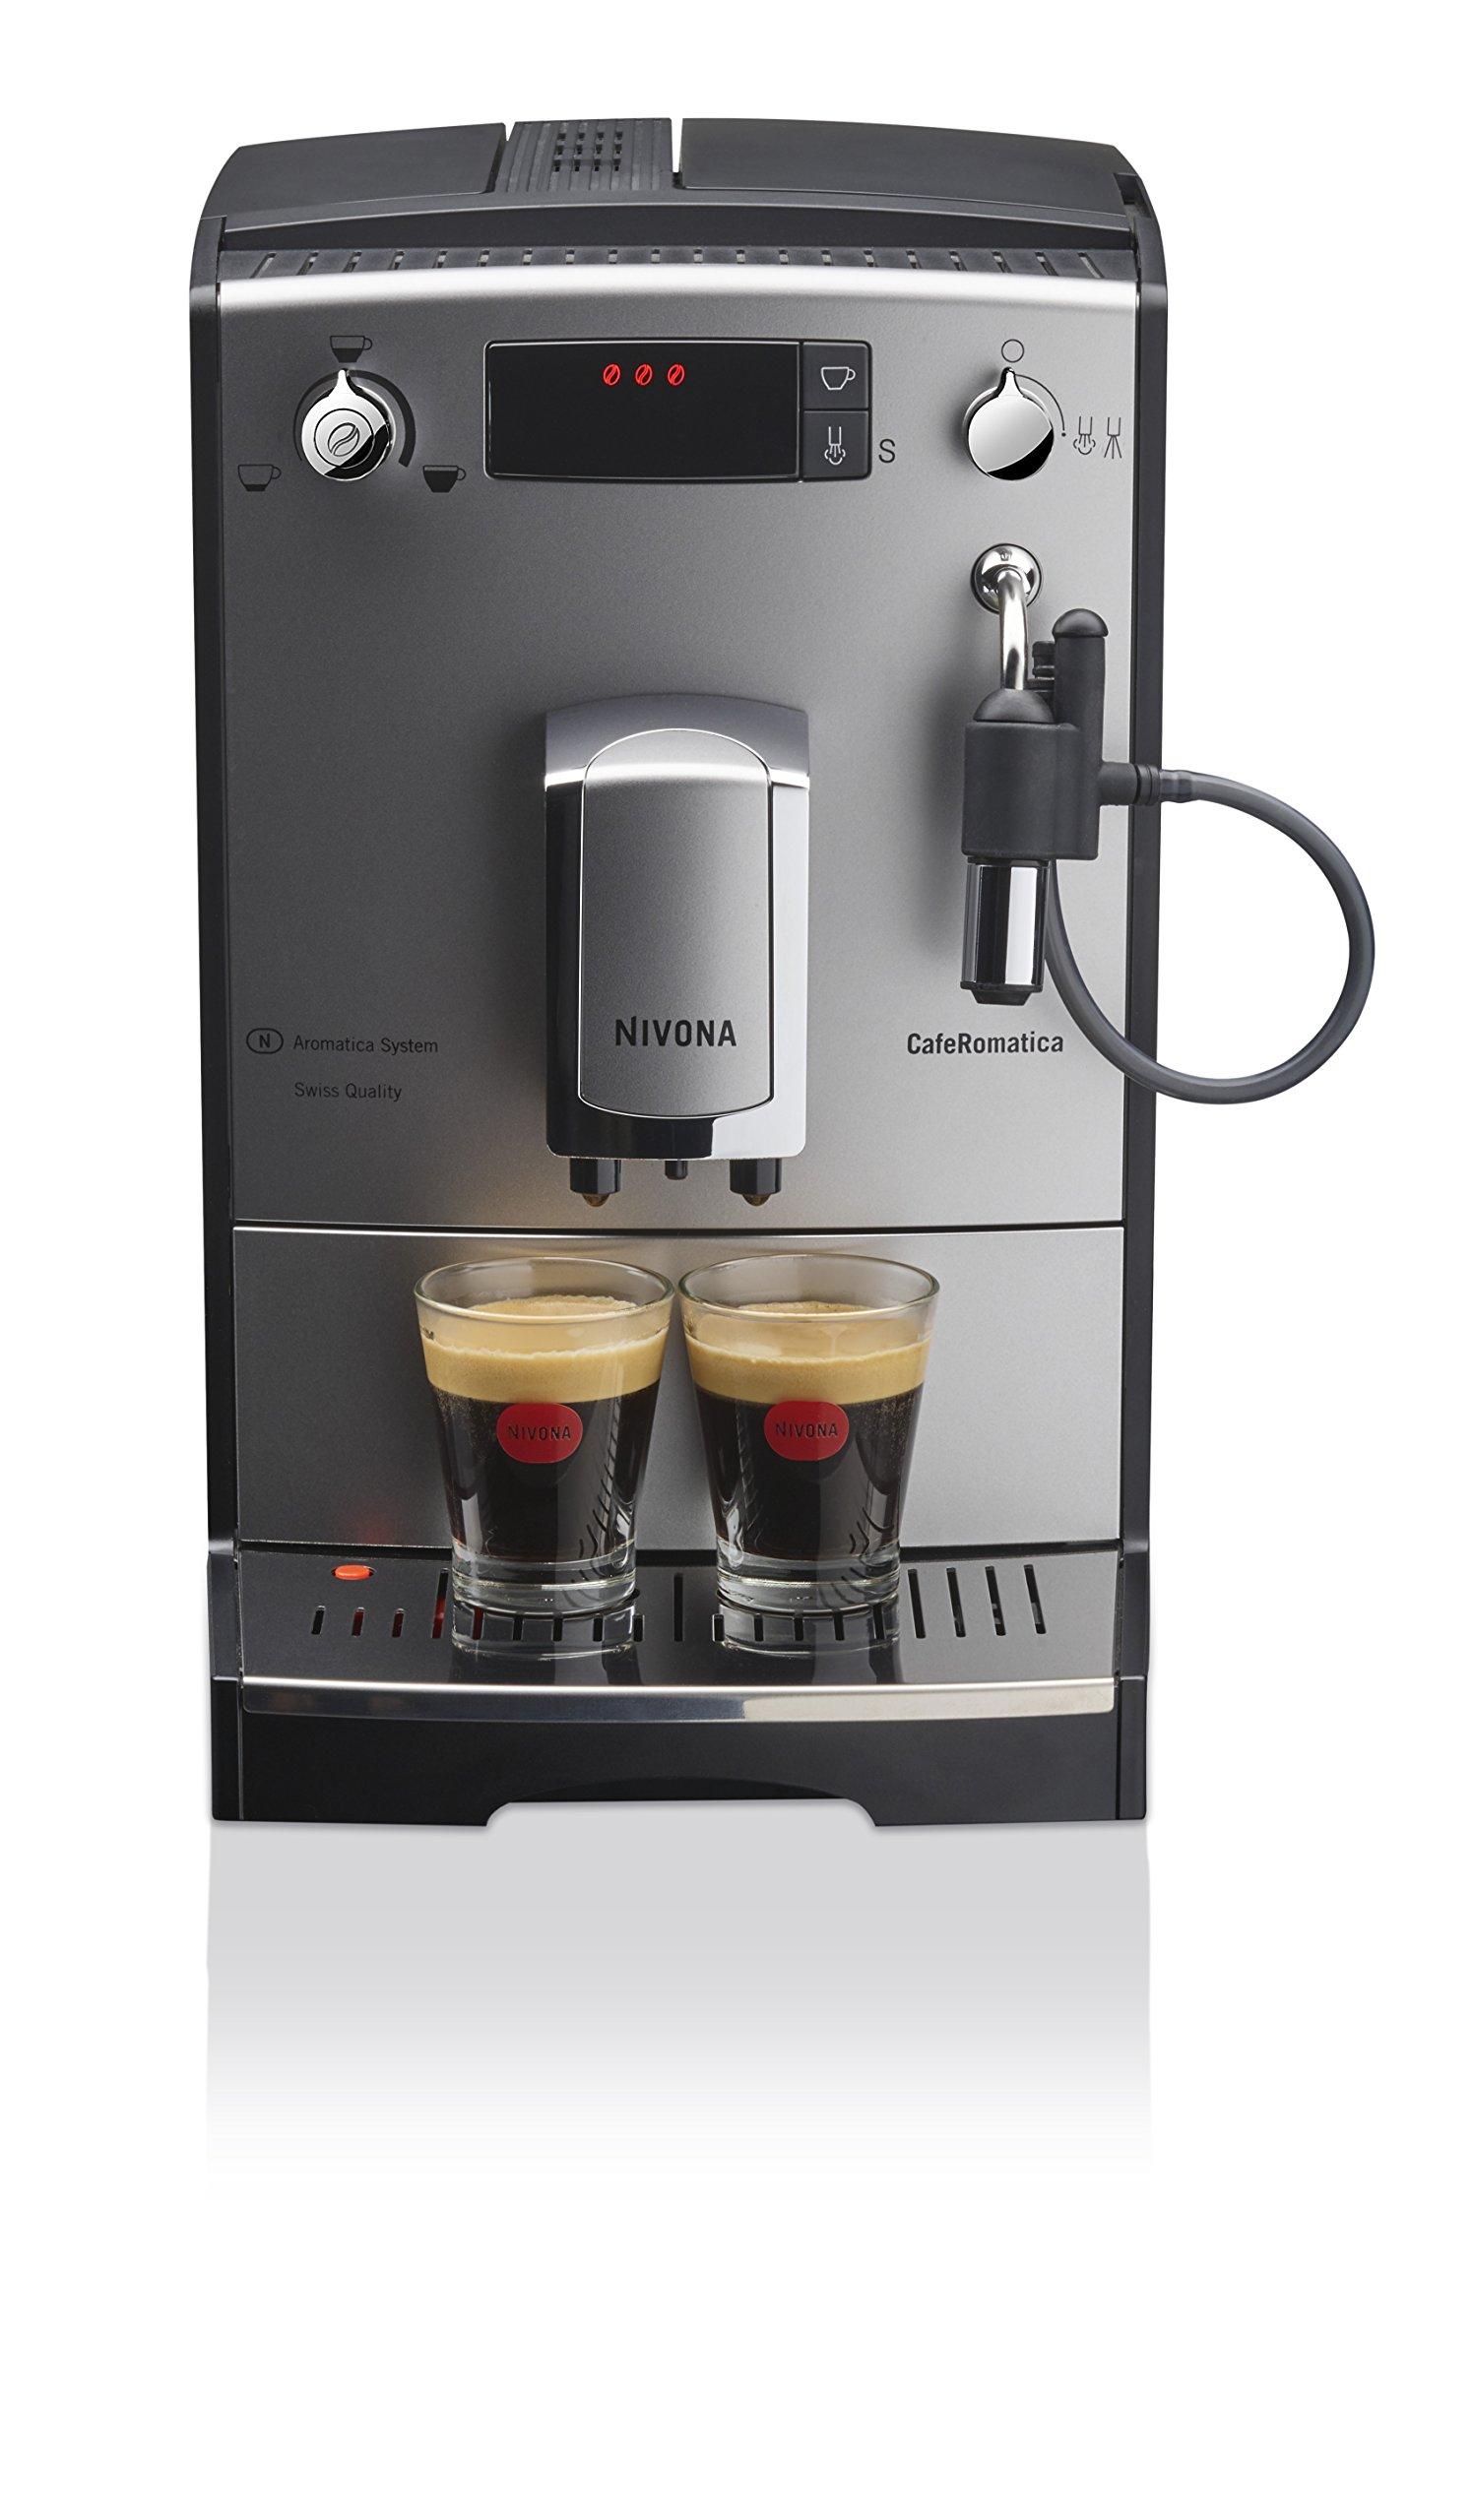 Nivona-Kaffeevollautomat-CafeRomatica-NICR-530